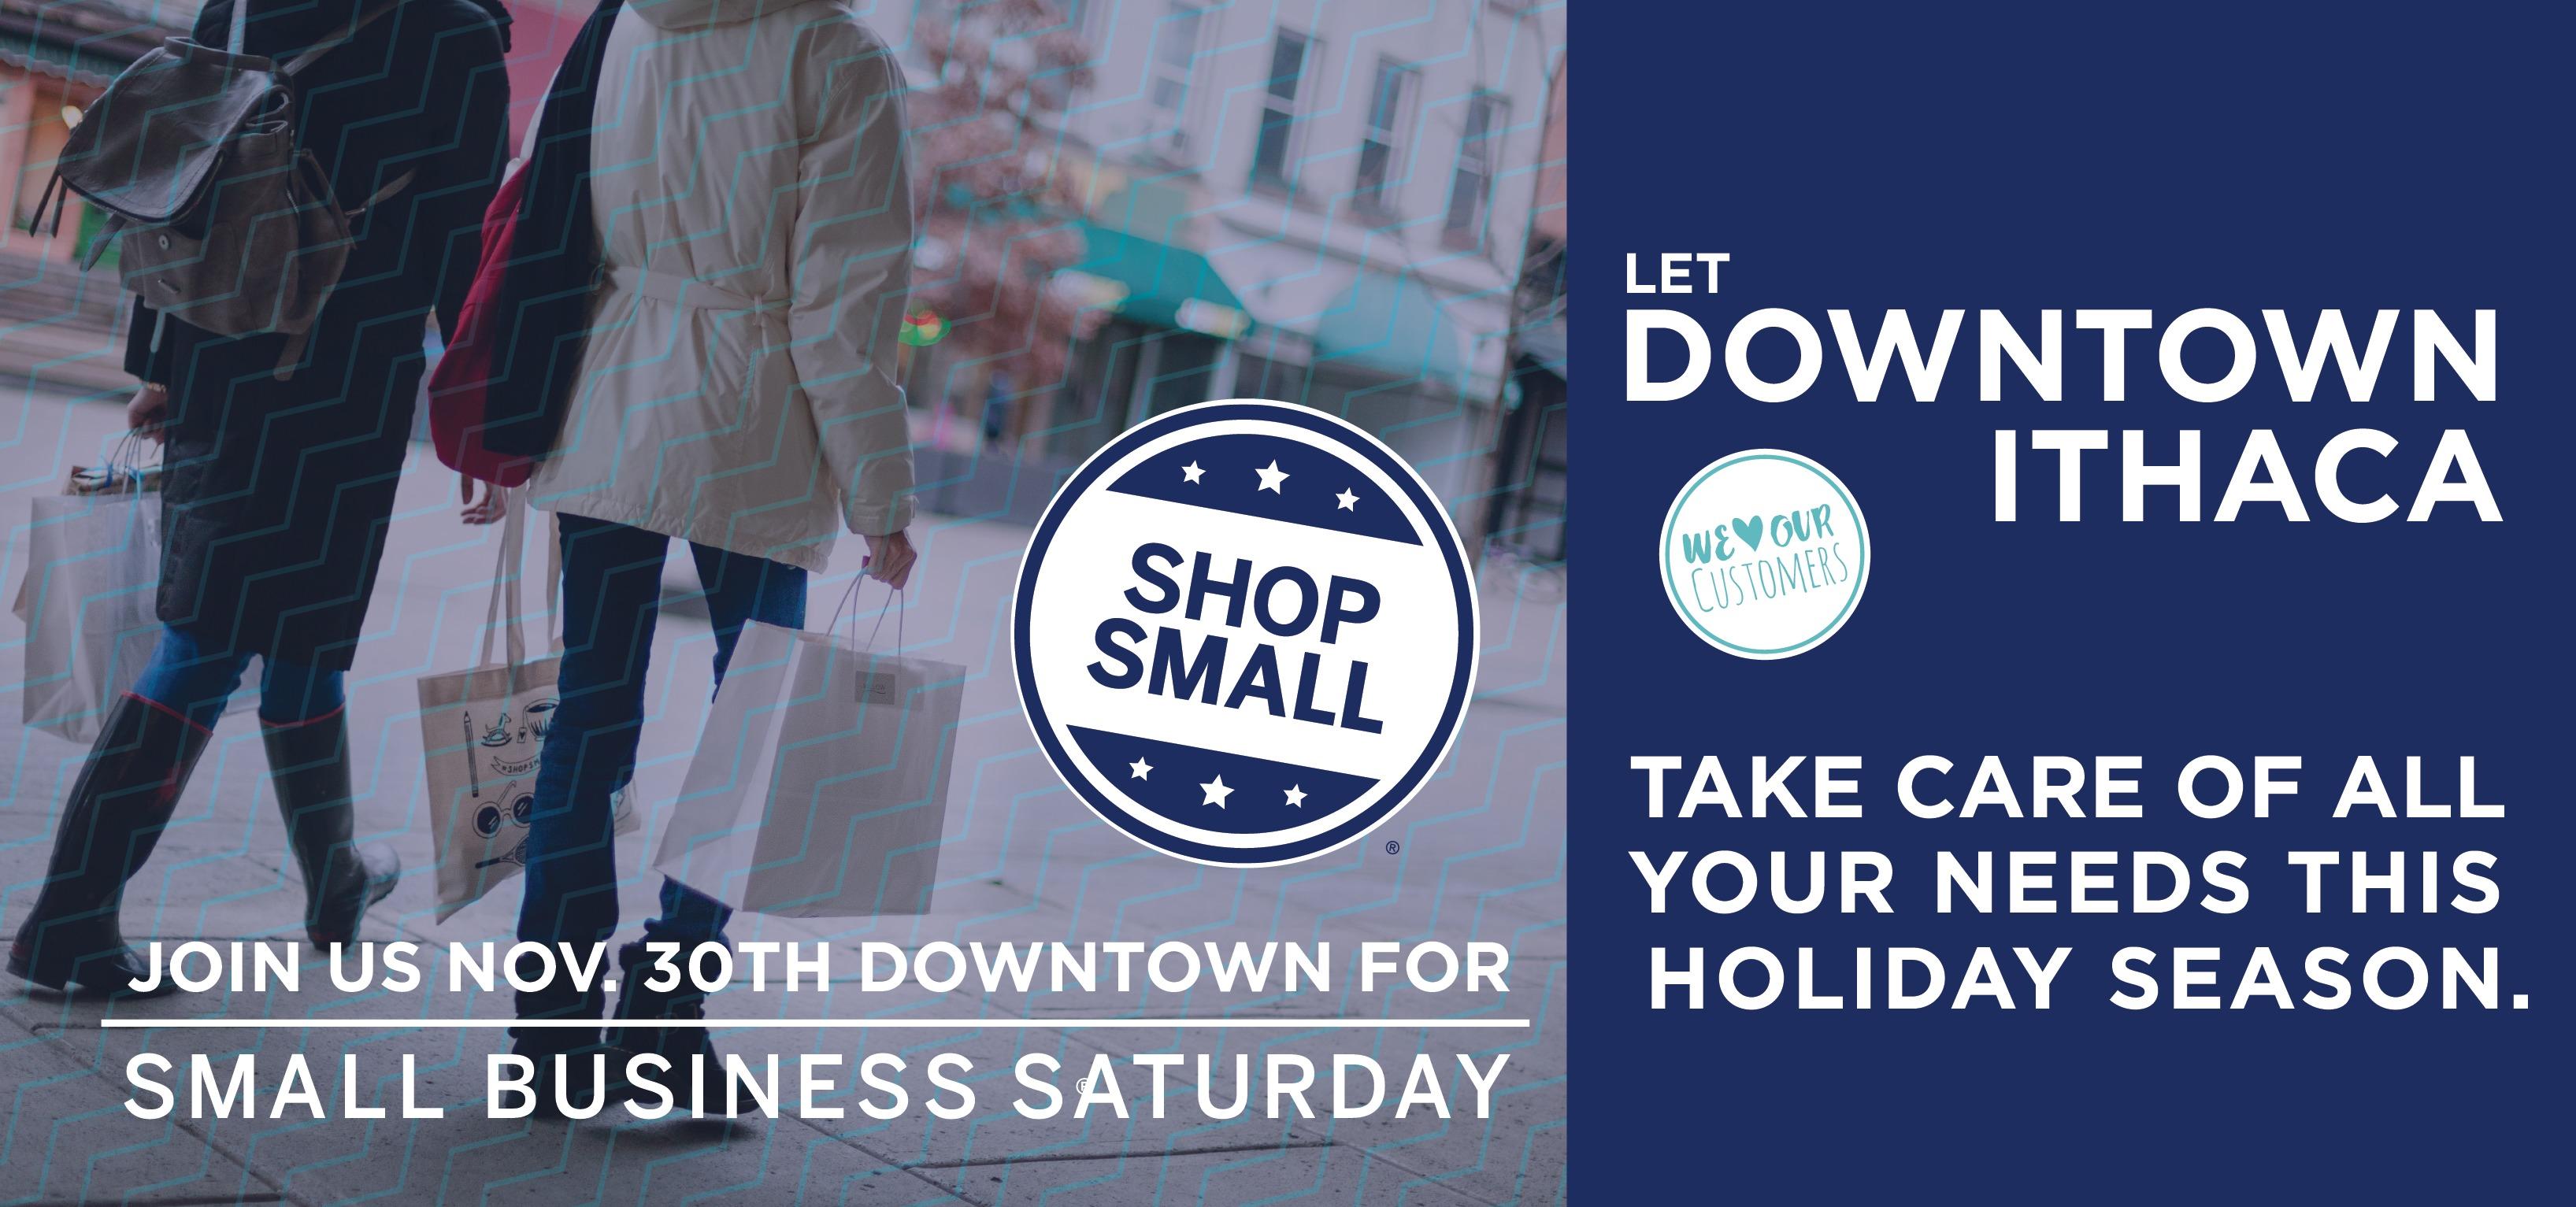 Small Business Saturday - Nov. 30, 2019